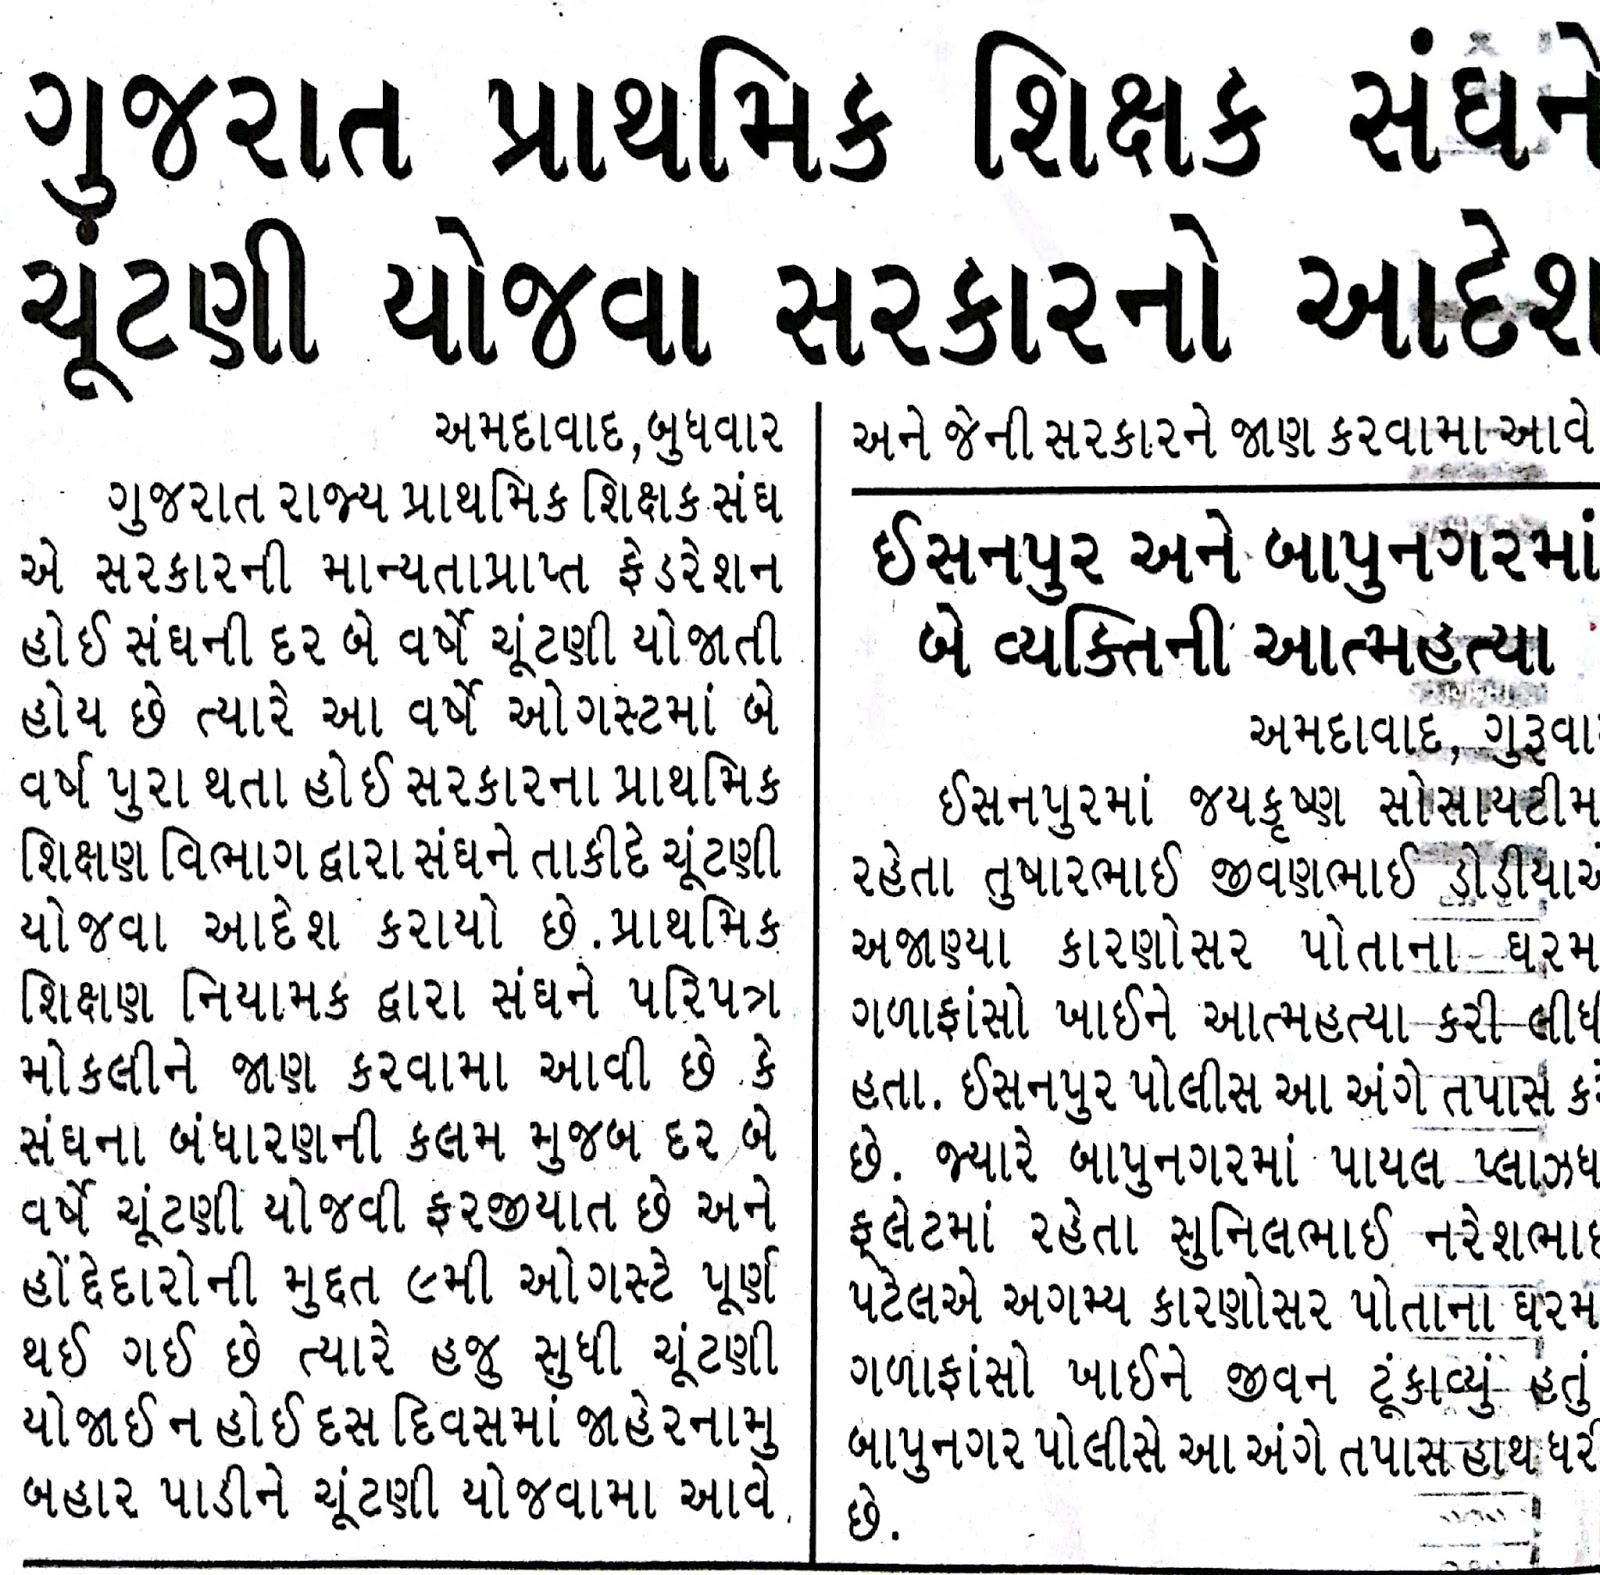 Gujarat Educational News Updates , India news,World News